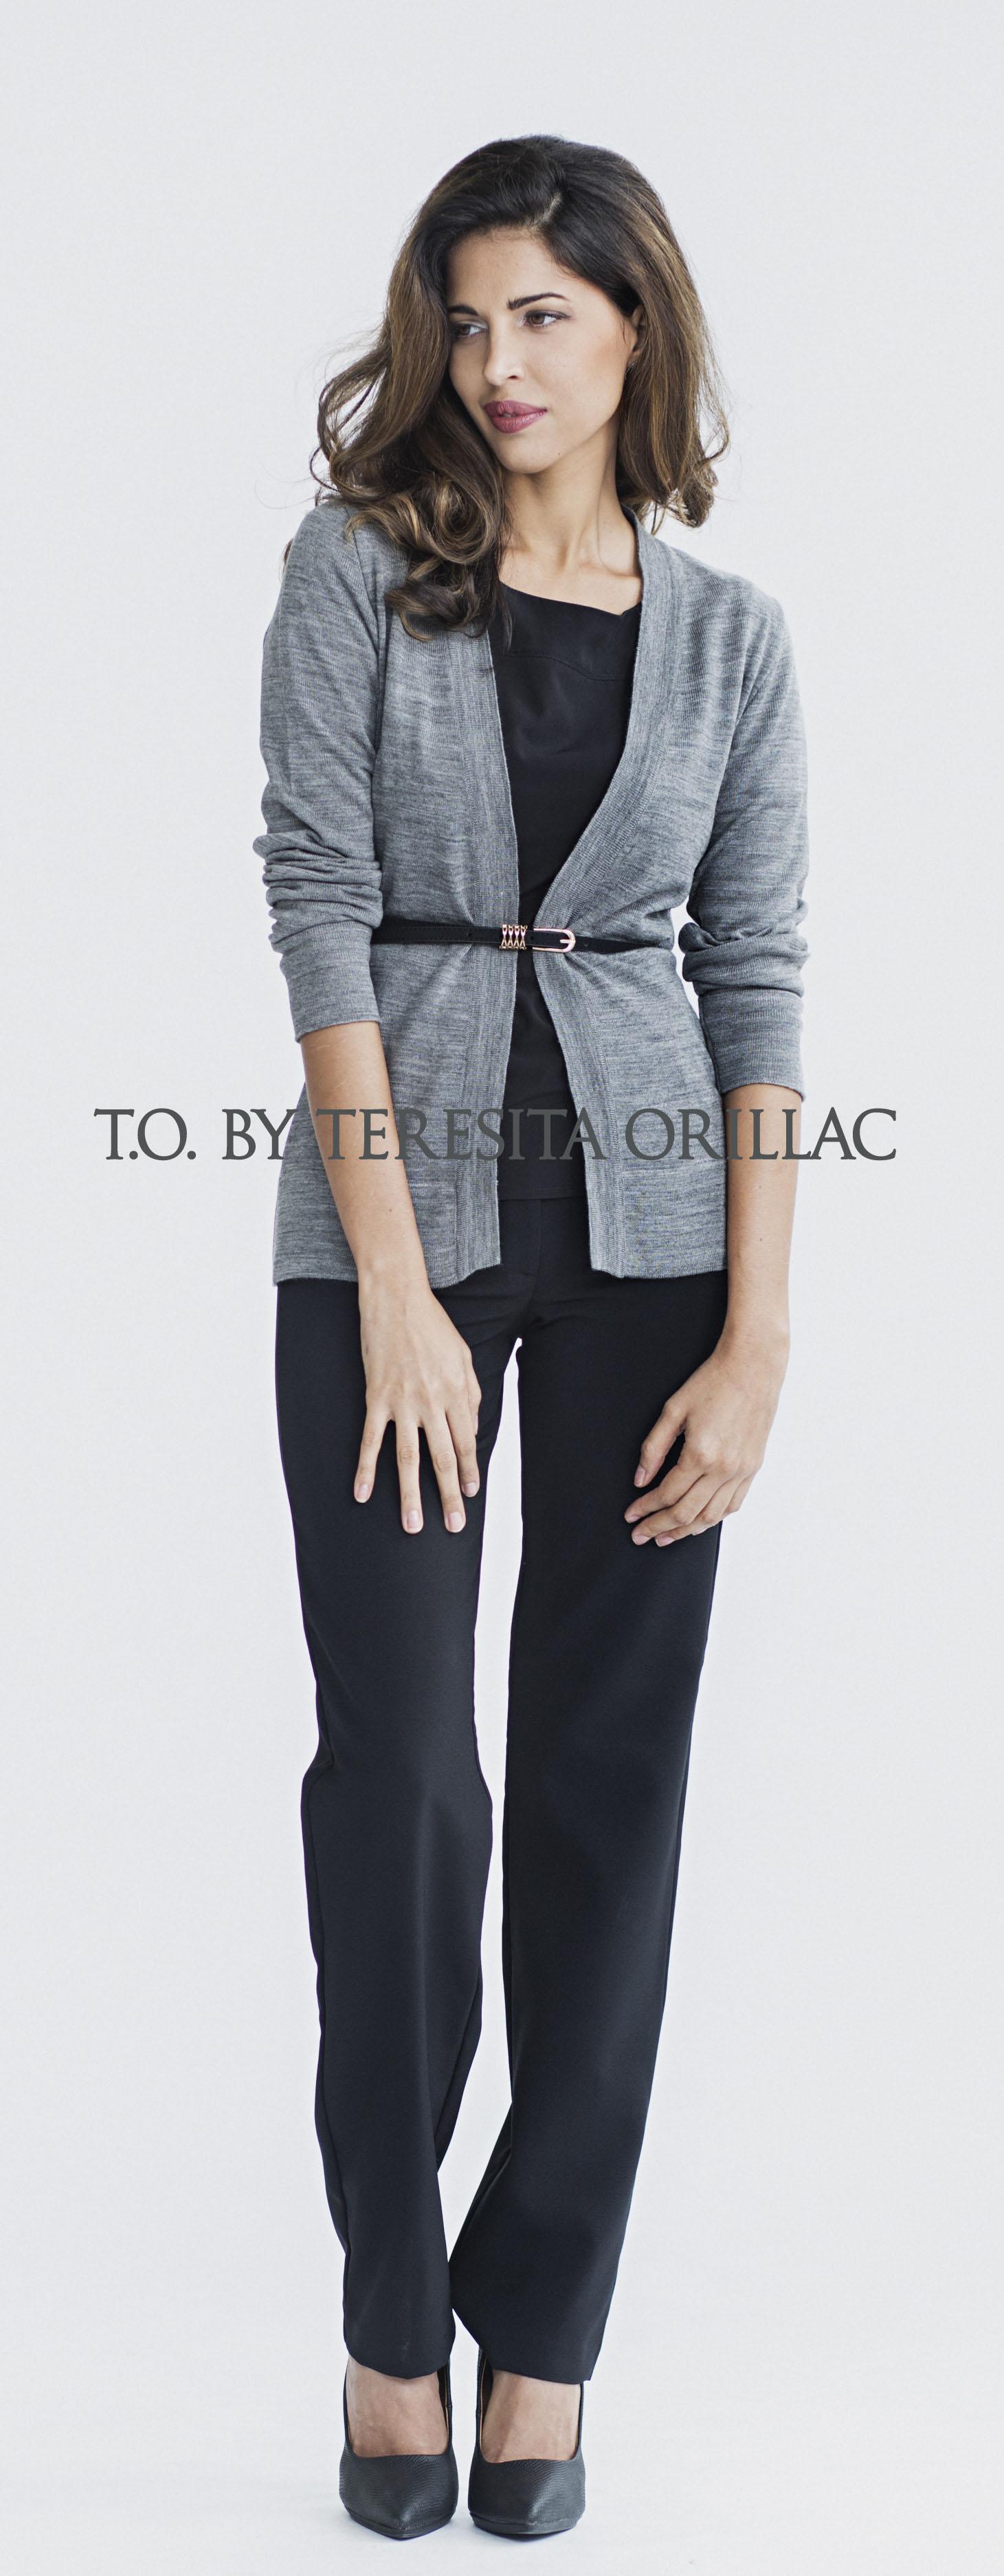 Uniformes panama ropa ejecutiva 15.jpg